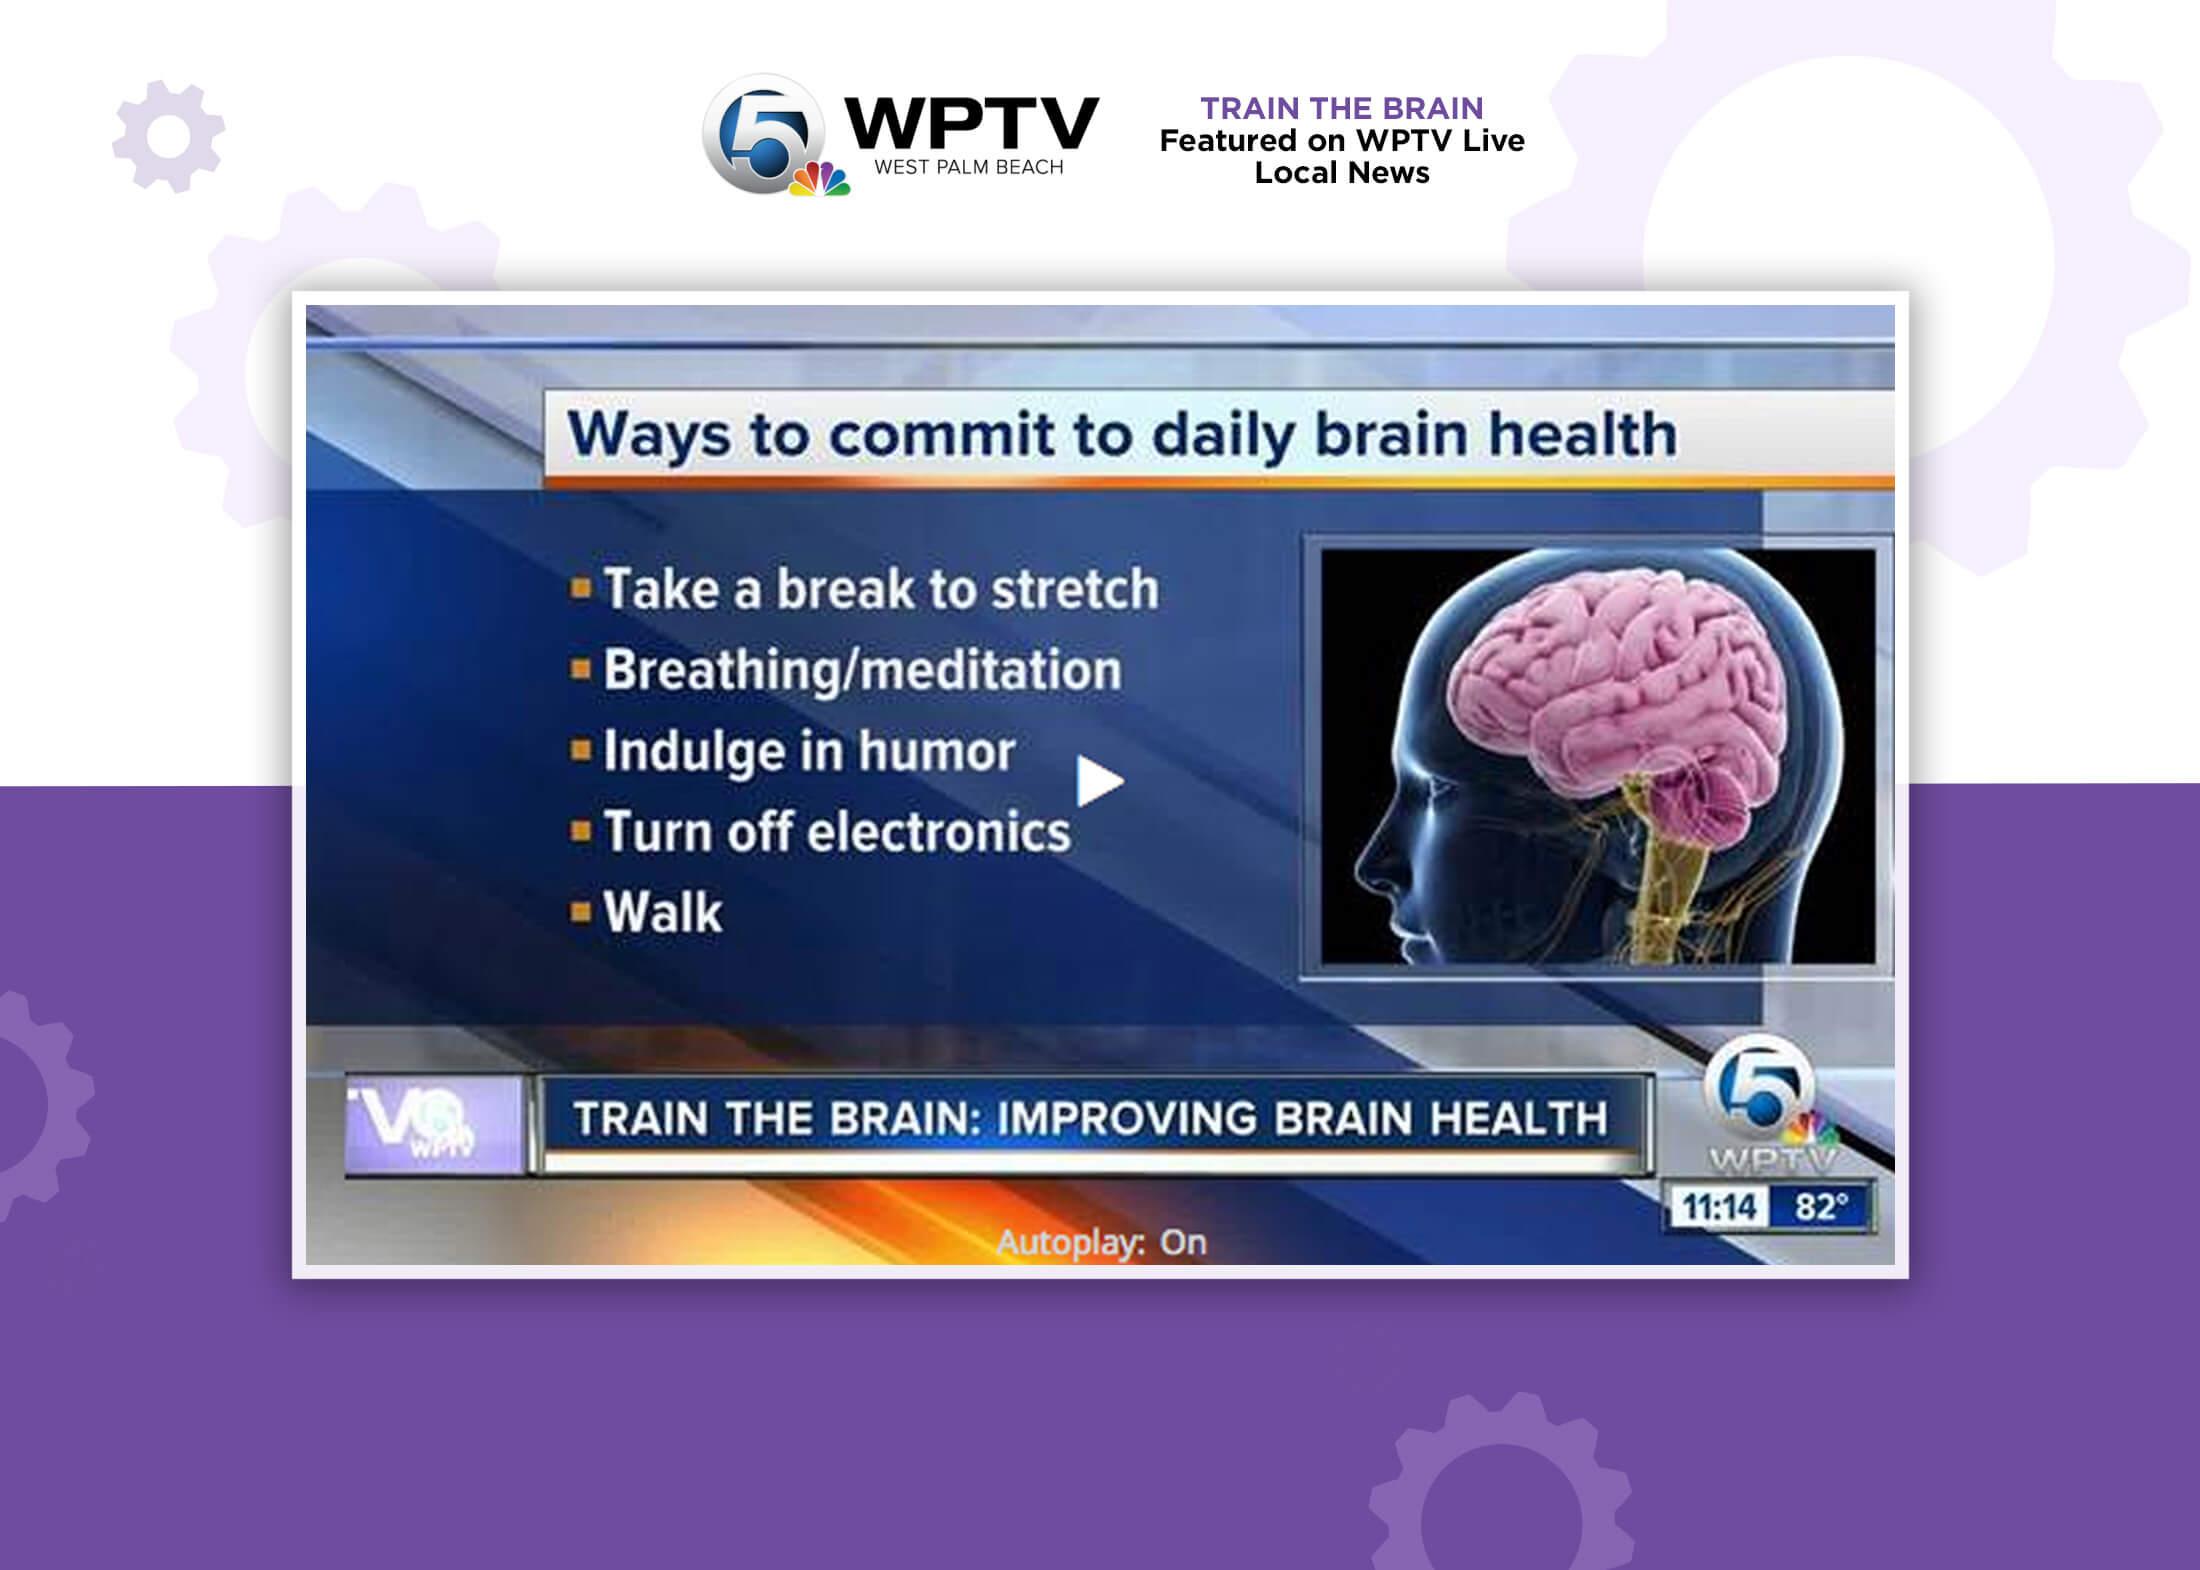 Train-The-Brain-Portfolio-On-The-News-2200×1570